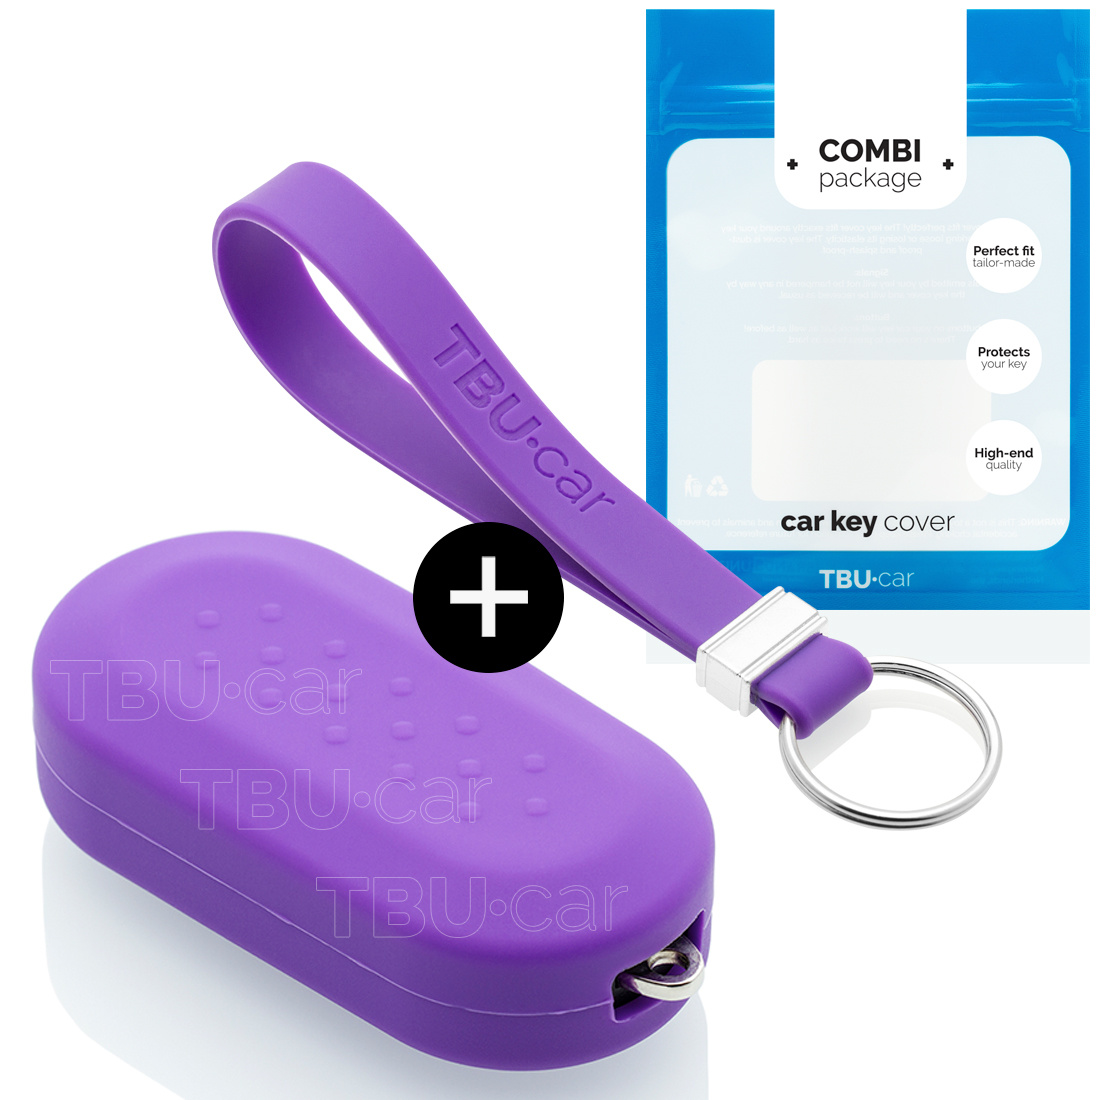 Fiat Autoschlüssel Hülle - Silikon Schutzhülle - Schlüsselhülle Cover - Violett